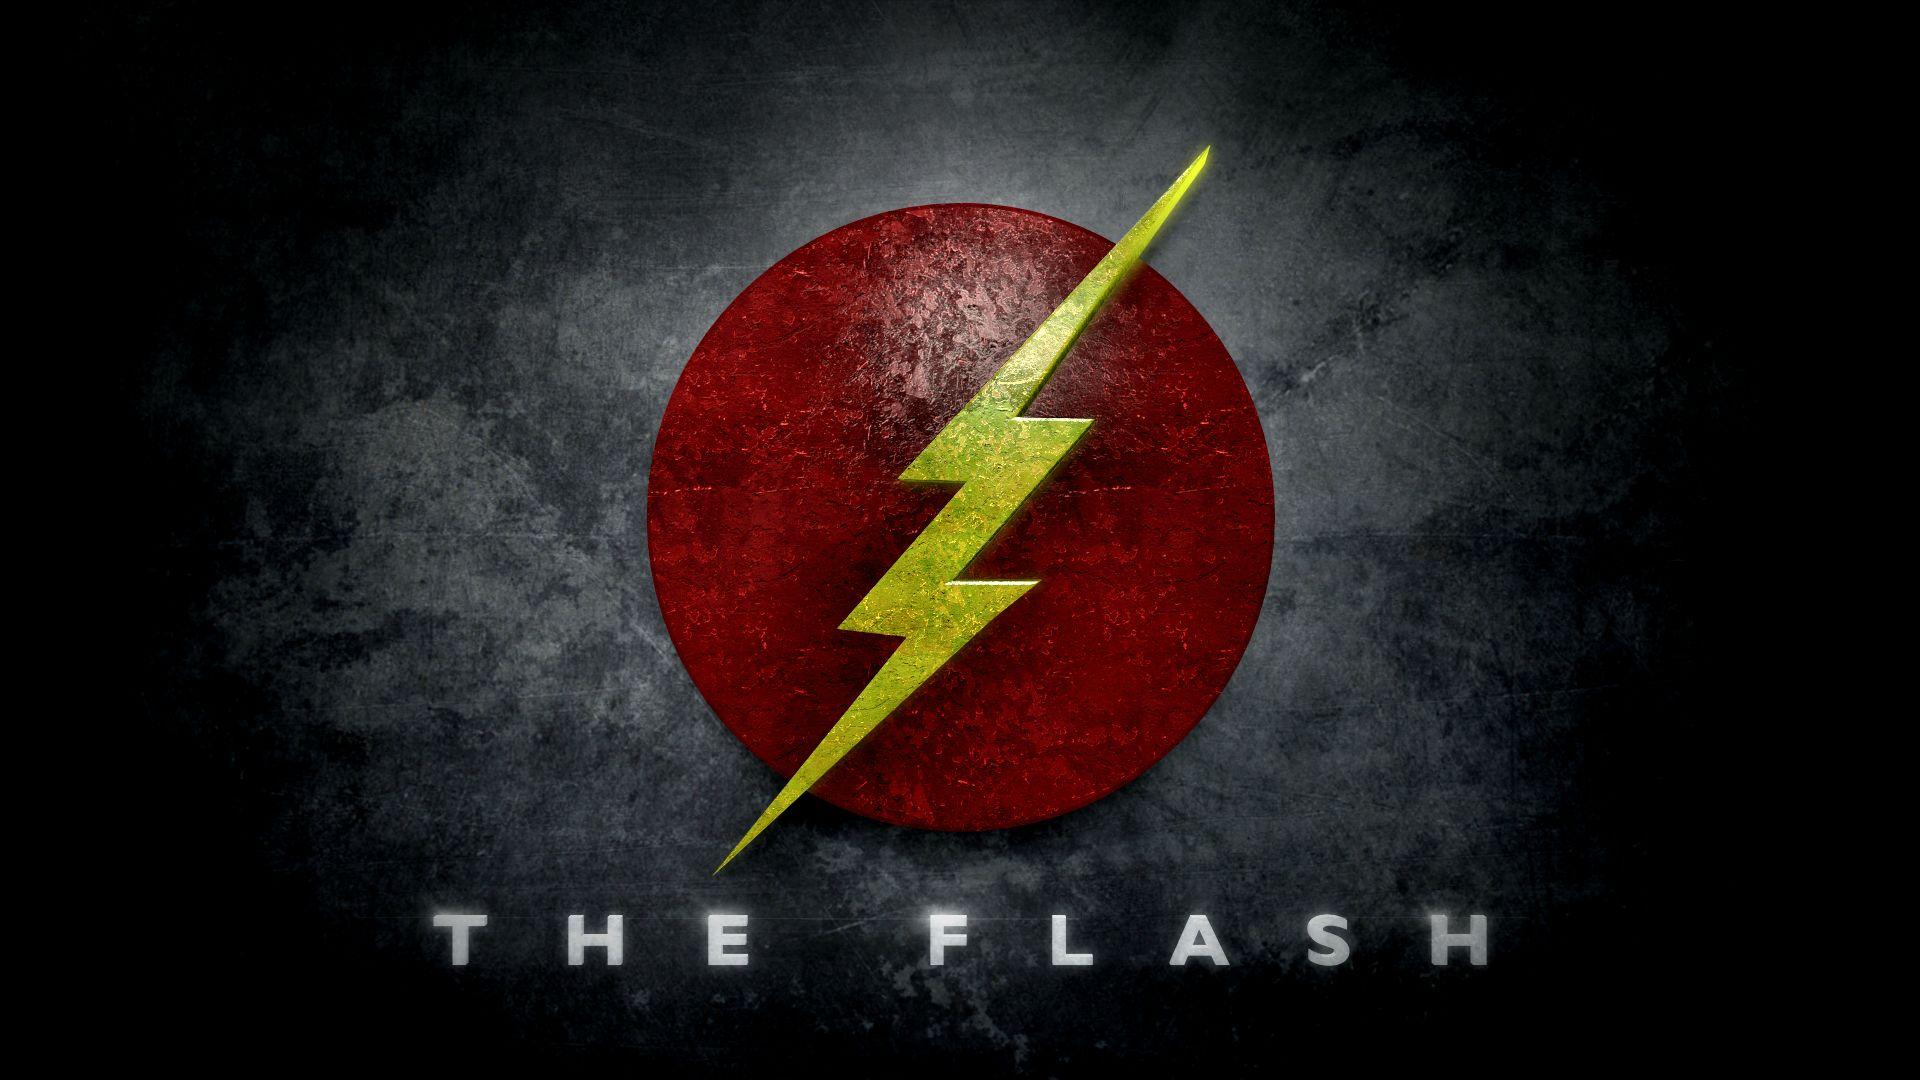 The Flash Logo Wallpaper Hd image gallery 1920x1080